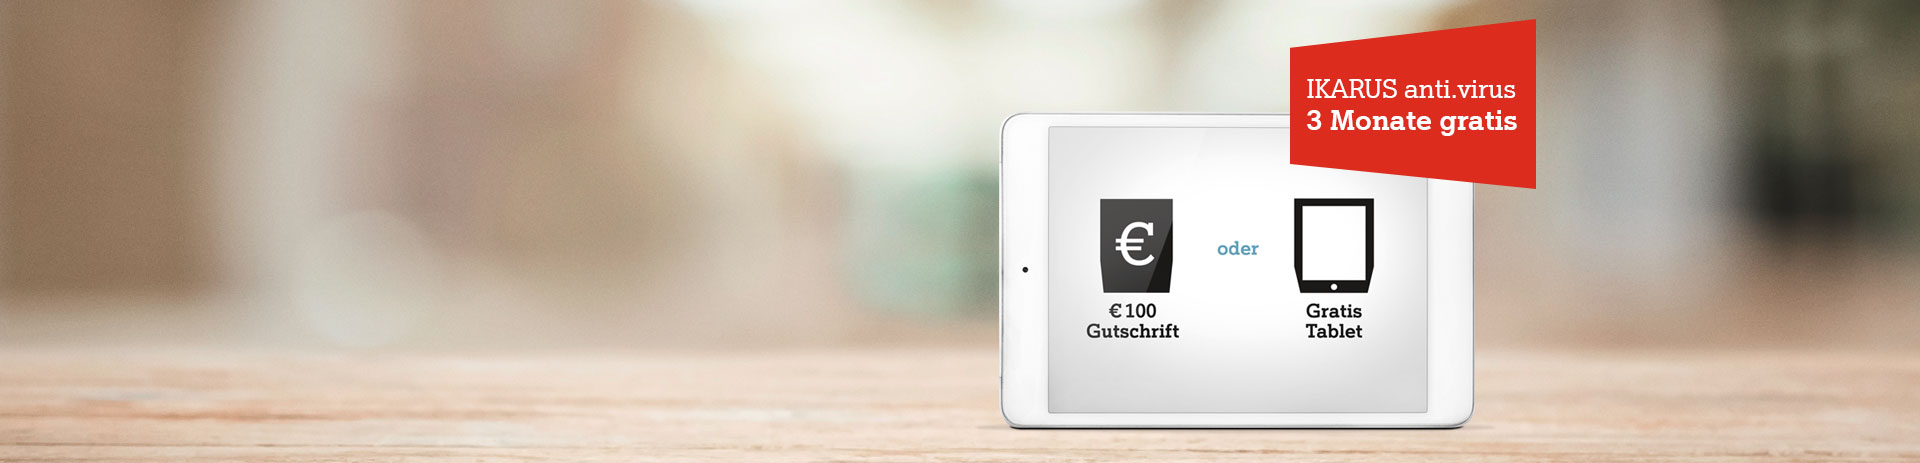 100 Euro Gutschrift oder Gratis Tablet bei Neubestellung Festnetz-Internet Business